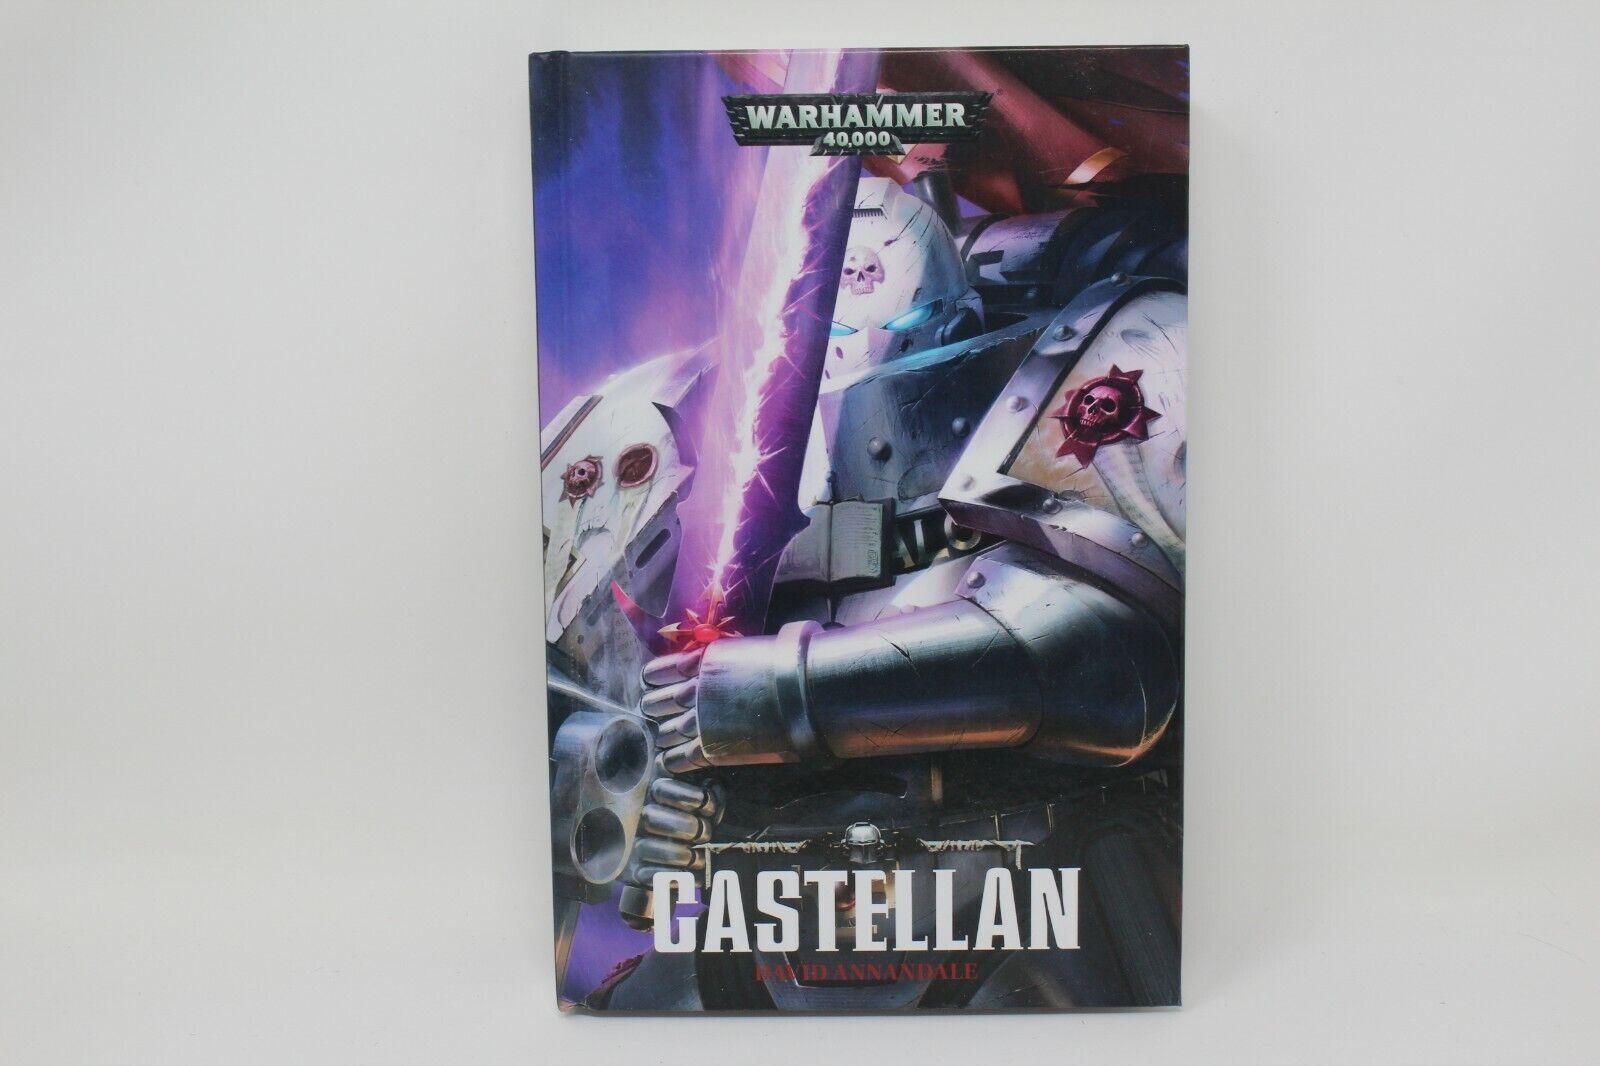 Warhammer Novel Castellan Hard Cover